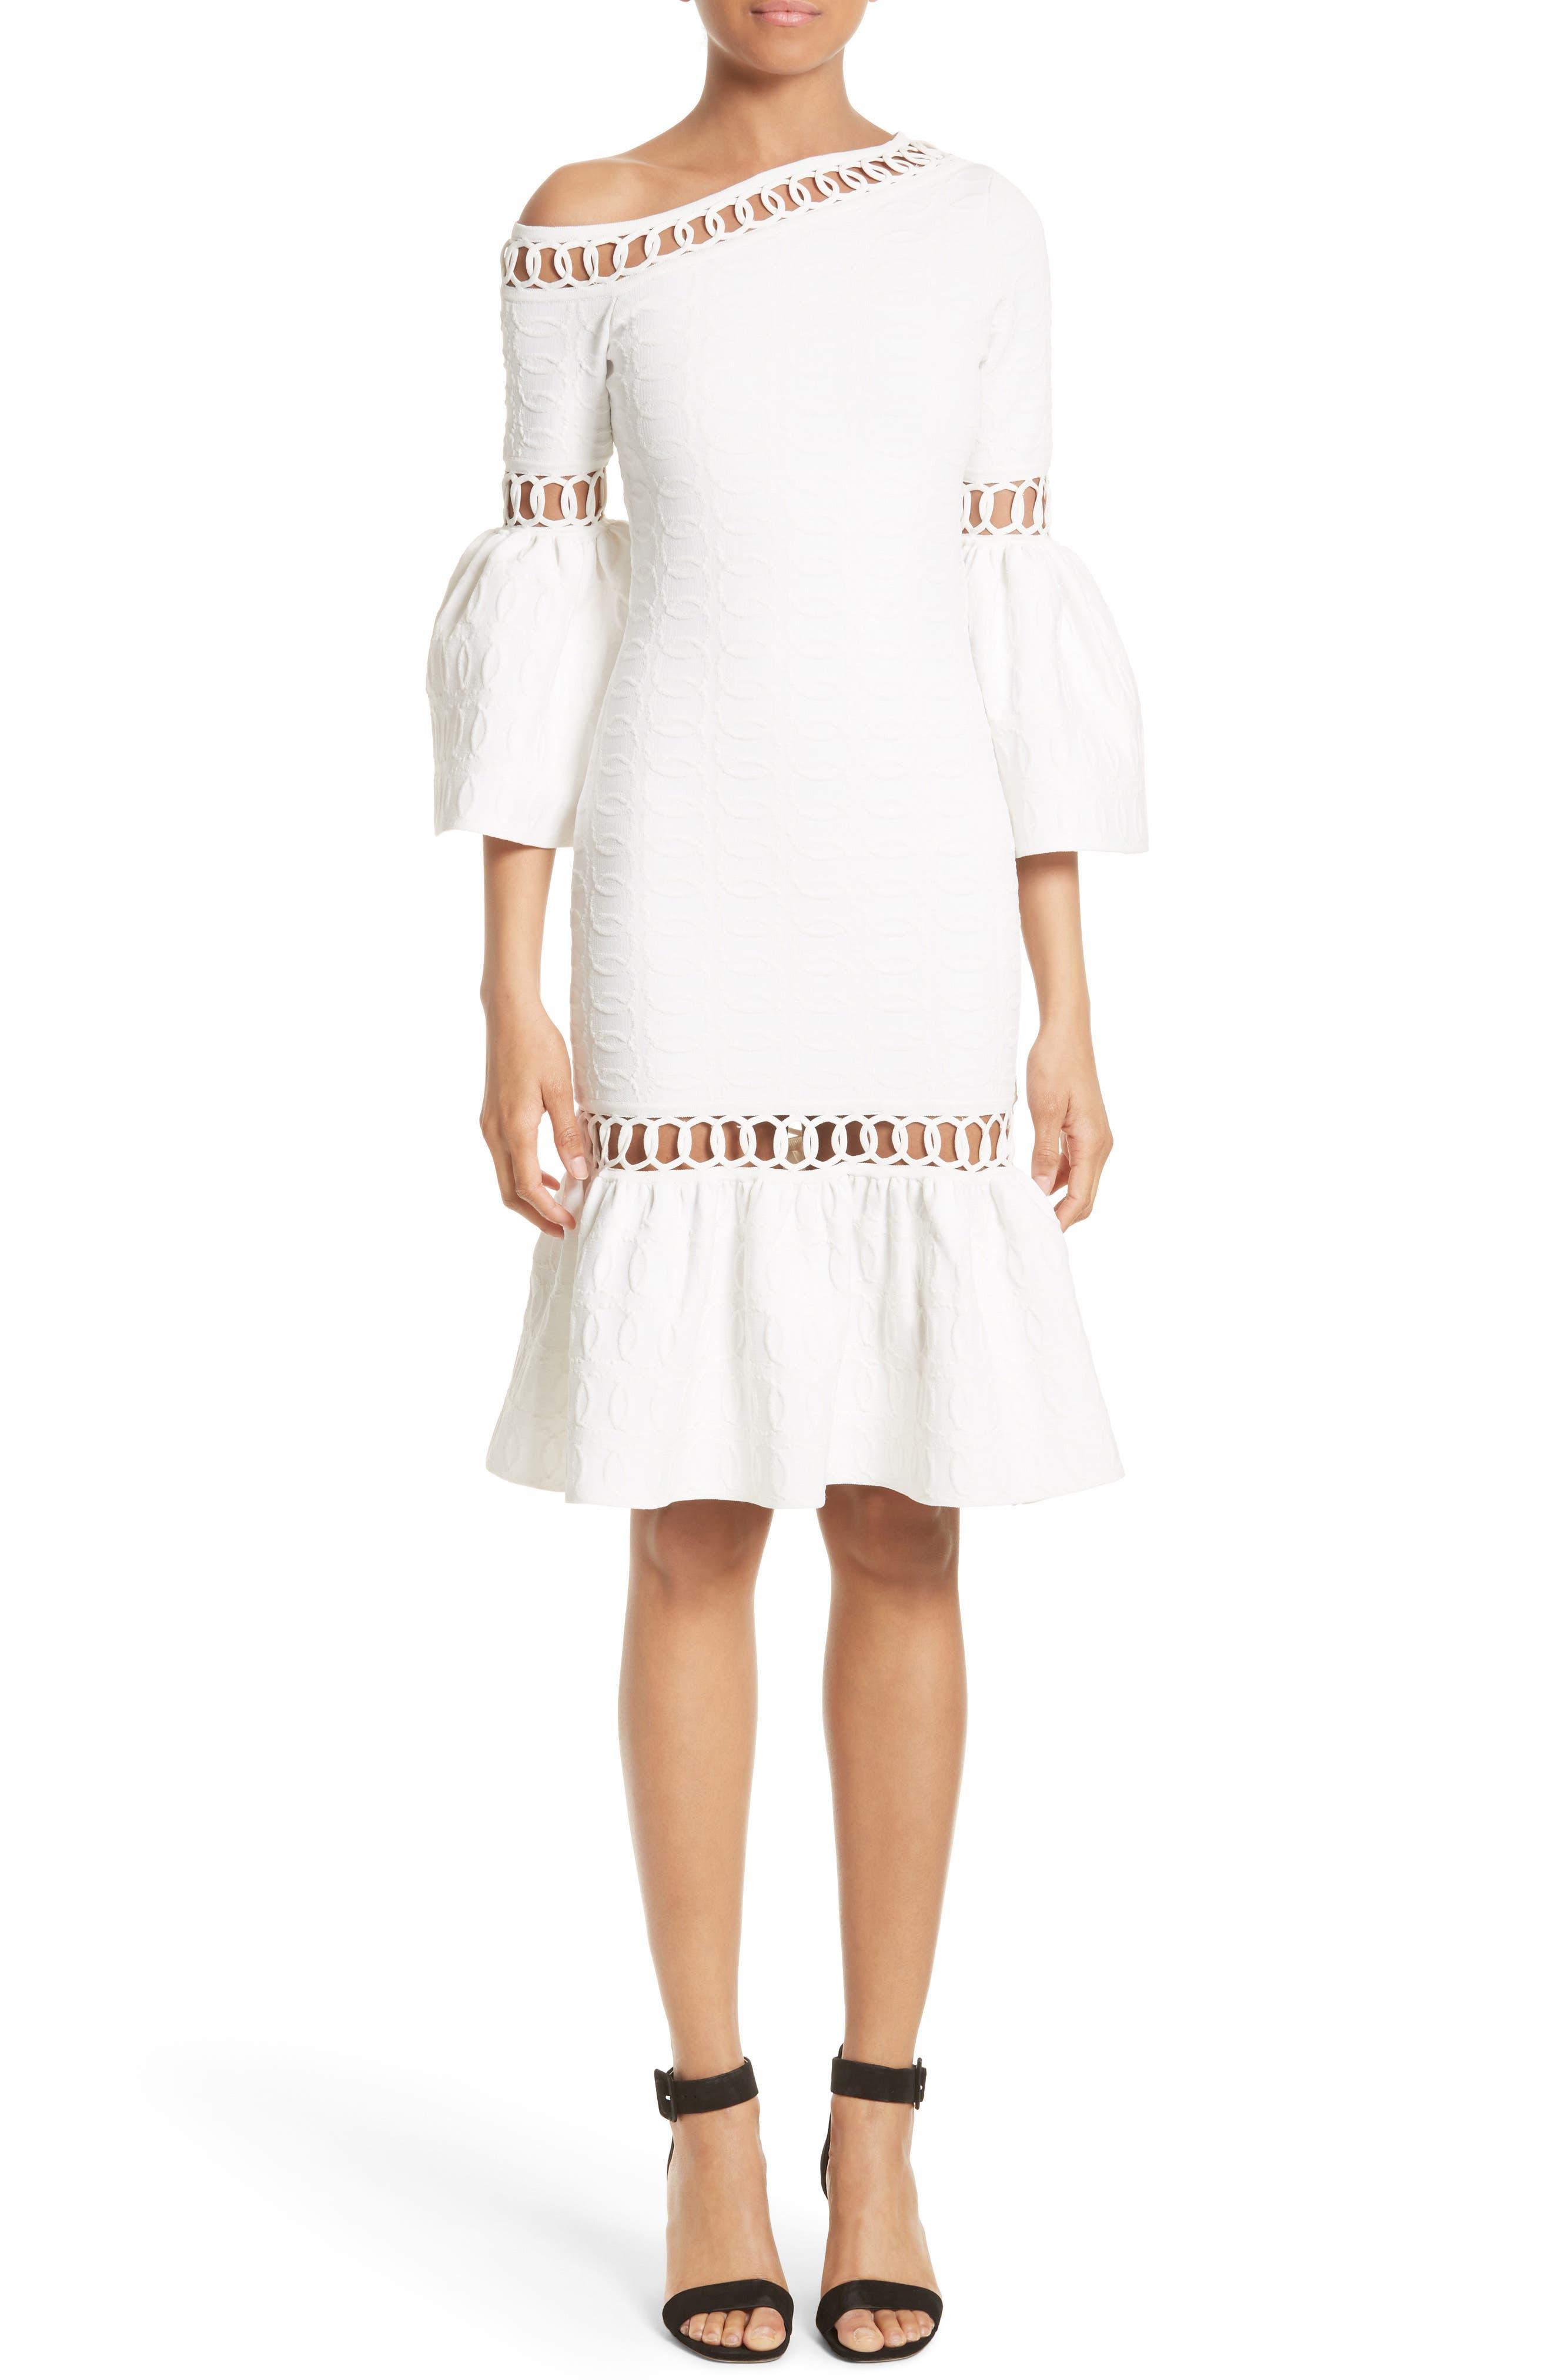 Main Image - Jonathan Simkhai Chain Link Lace Fit & Flare Dress